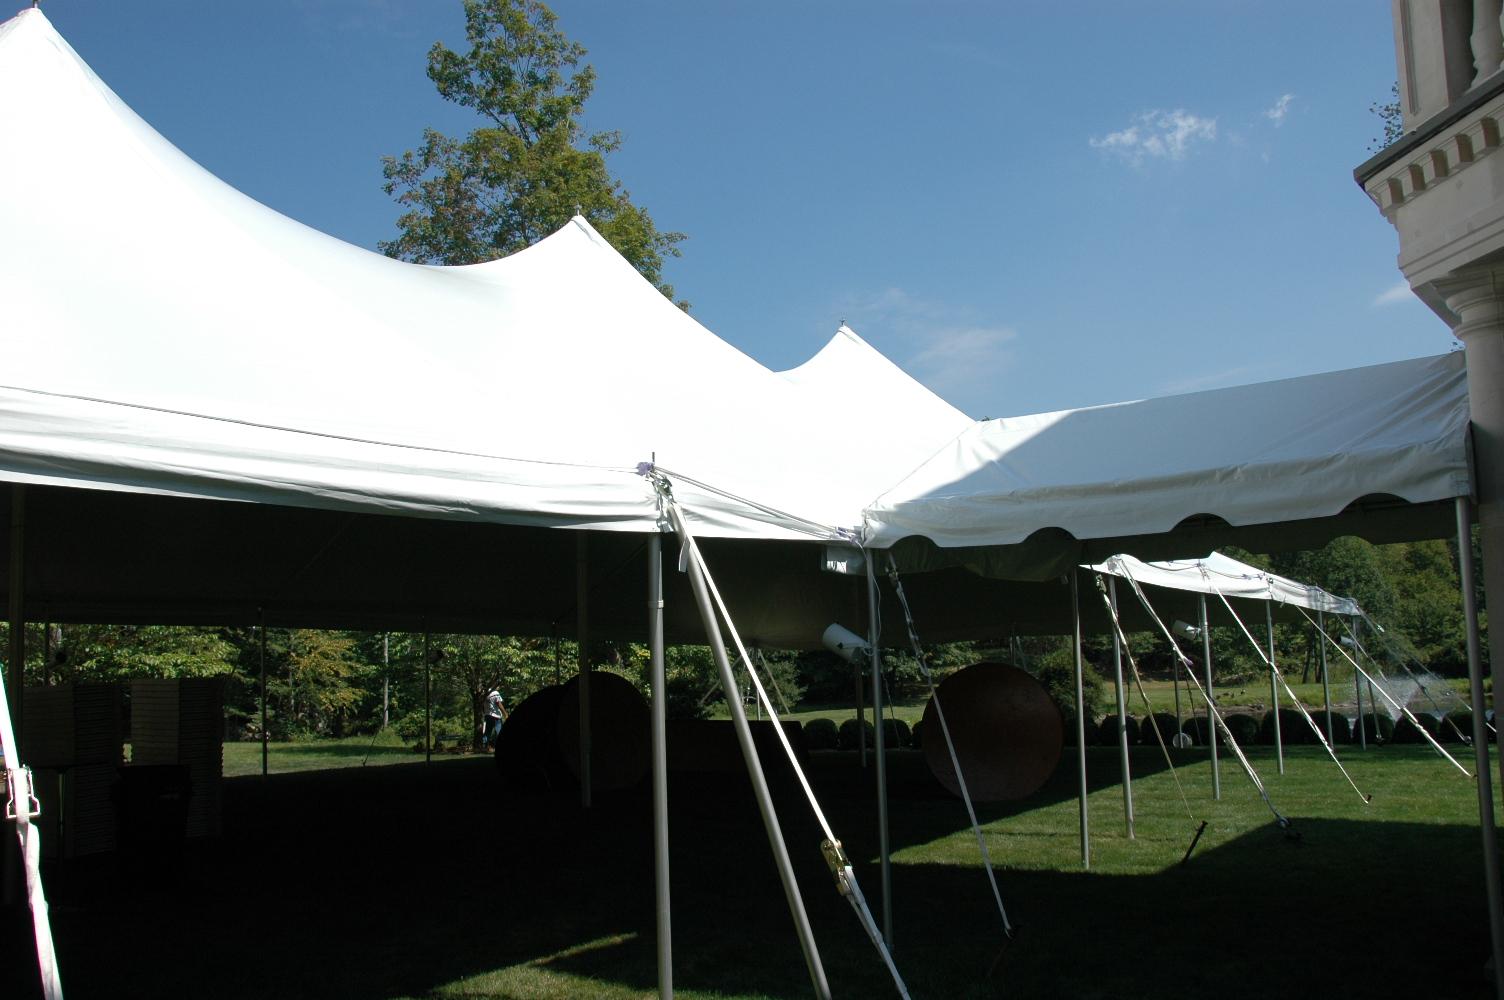 Sold By Costco Carport : Canopy tent rainwear